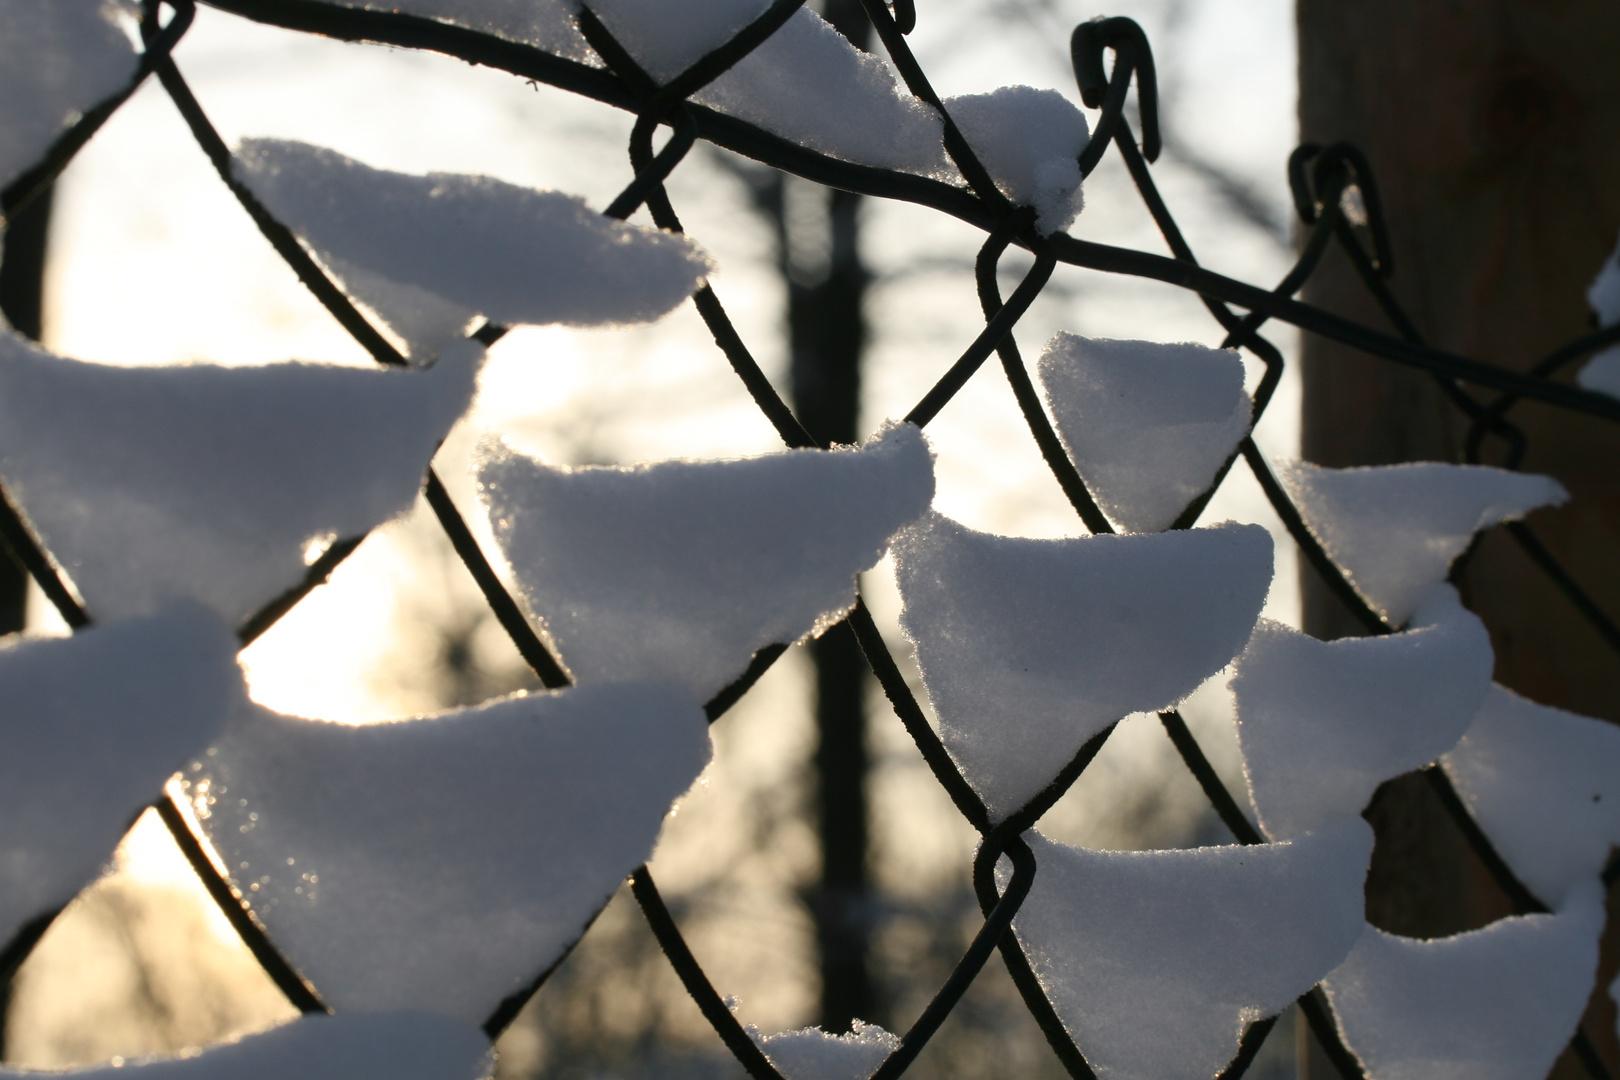 Maschendrahtzaun im Winter